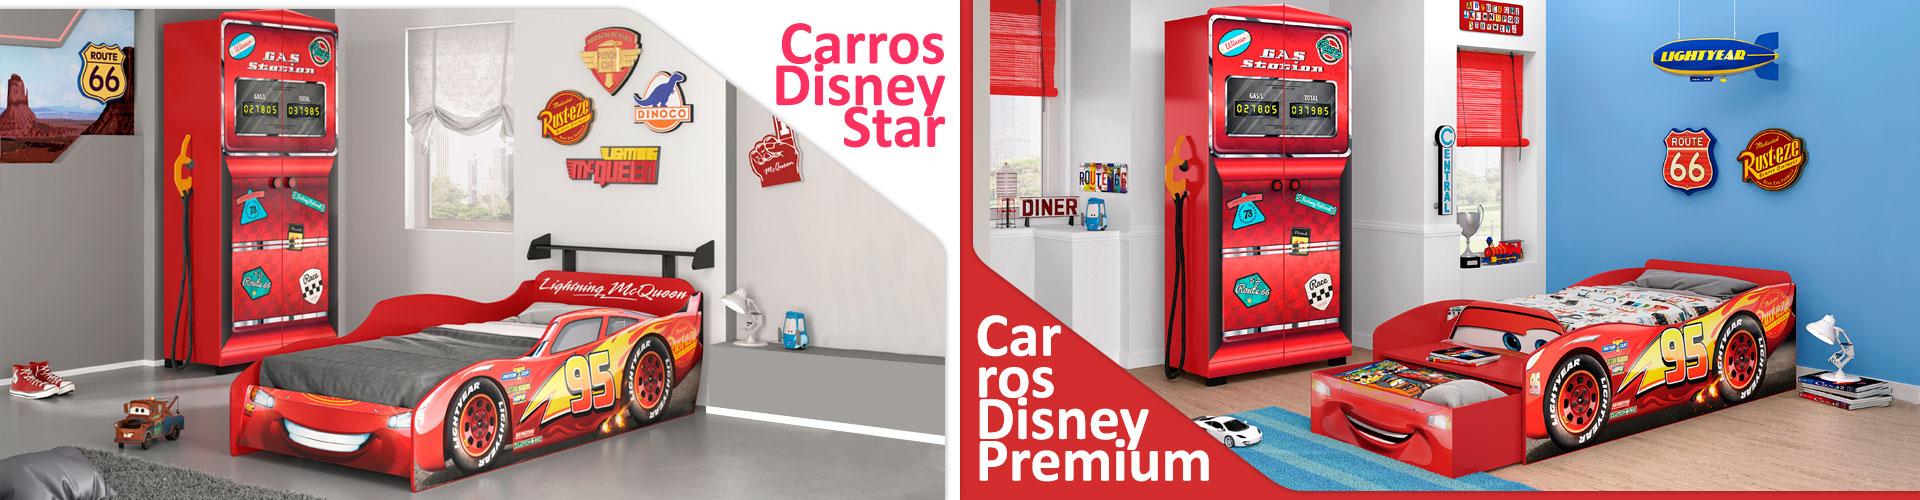 banner_meninos_carros-star_premium